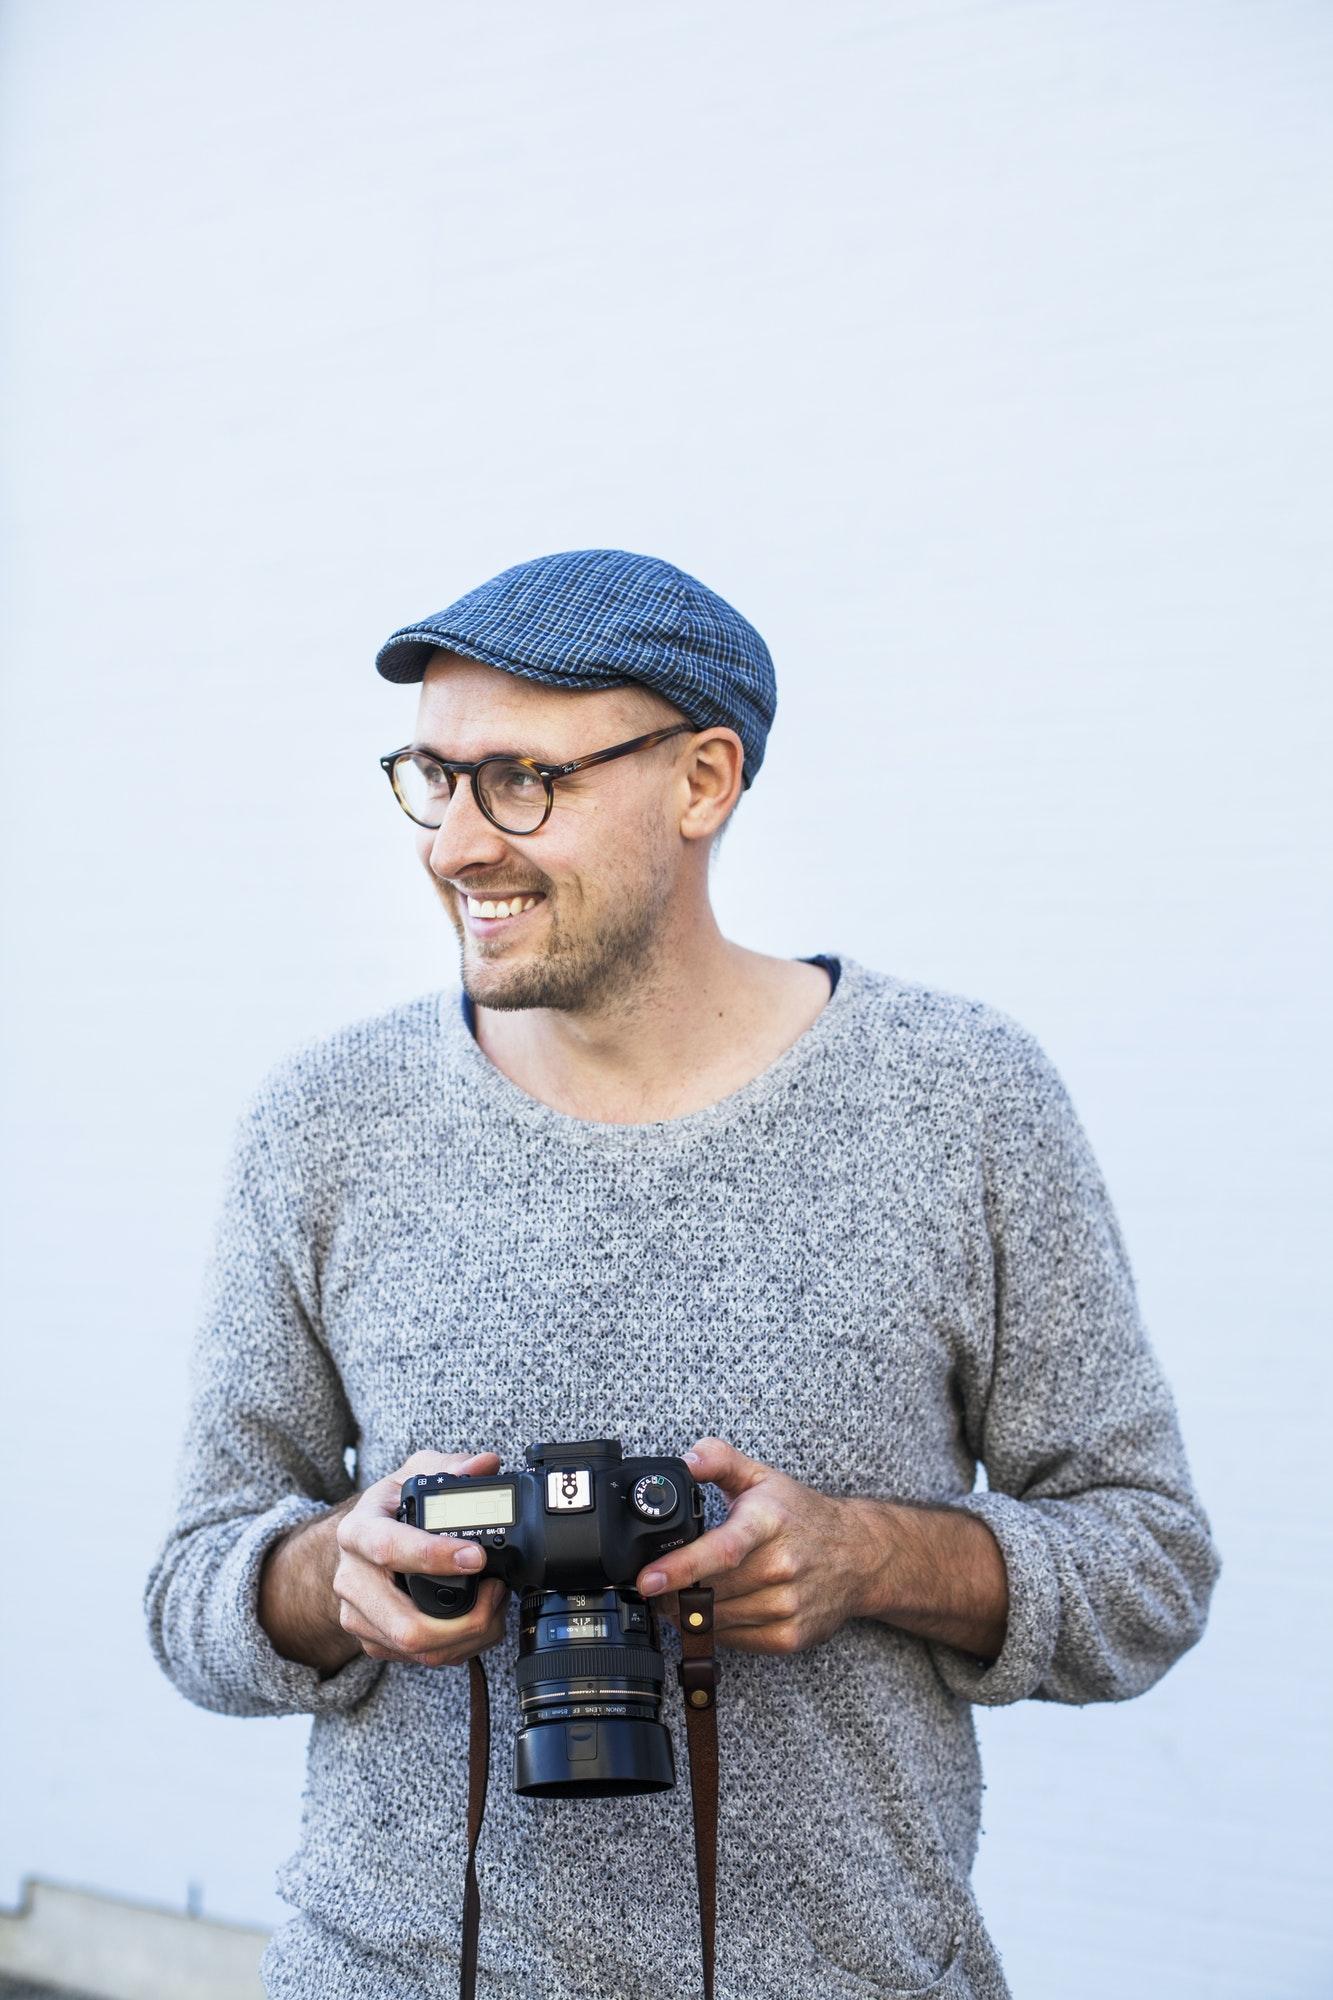 Happy man holding digital camera against wall